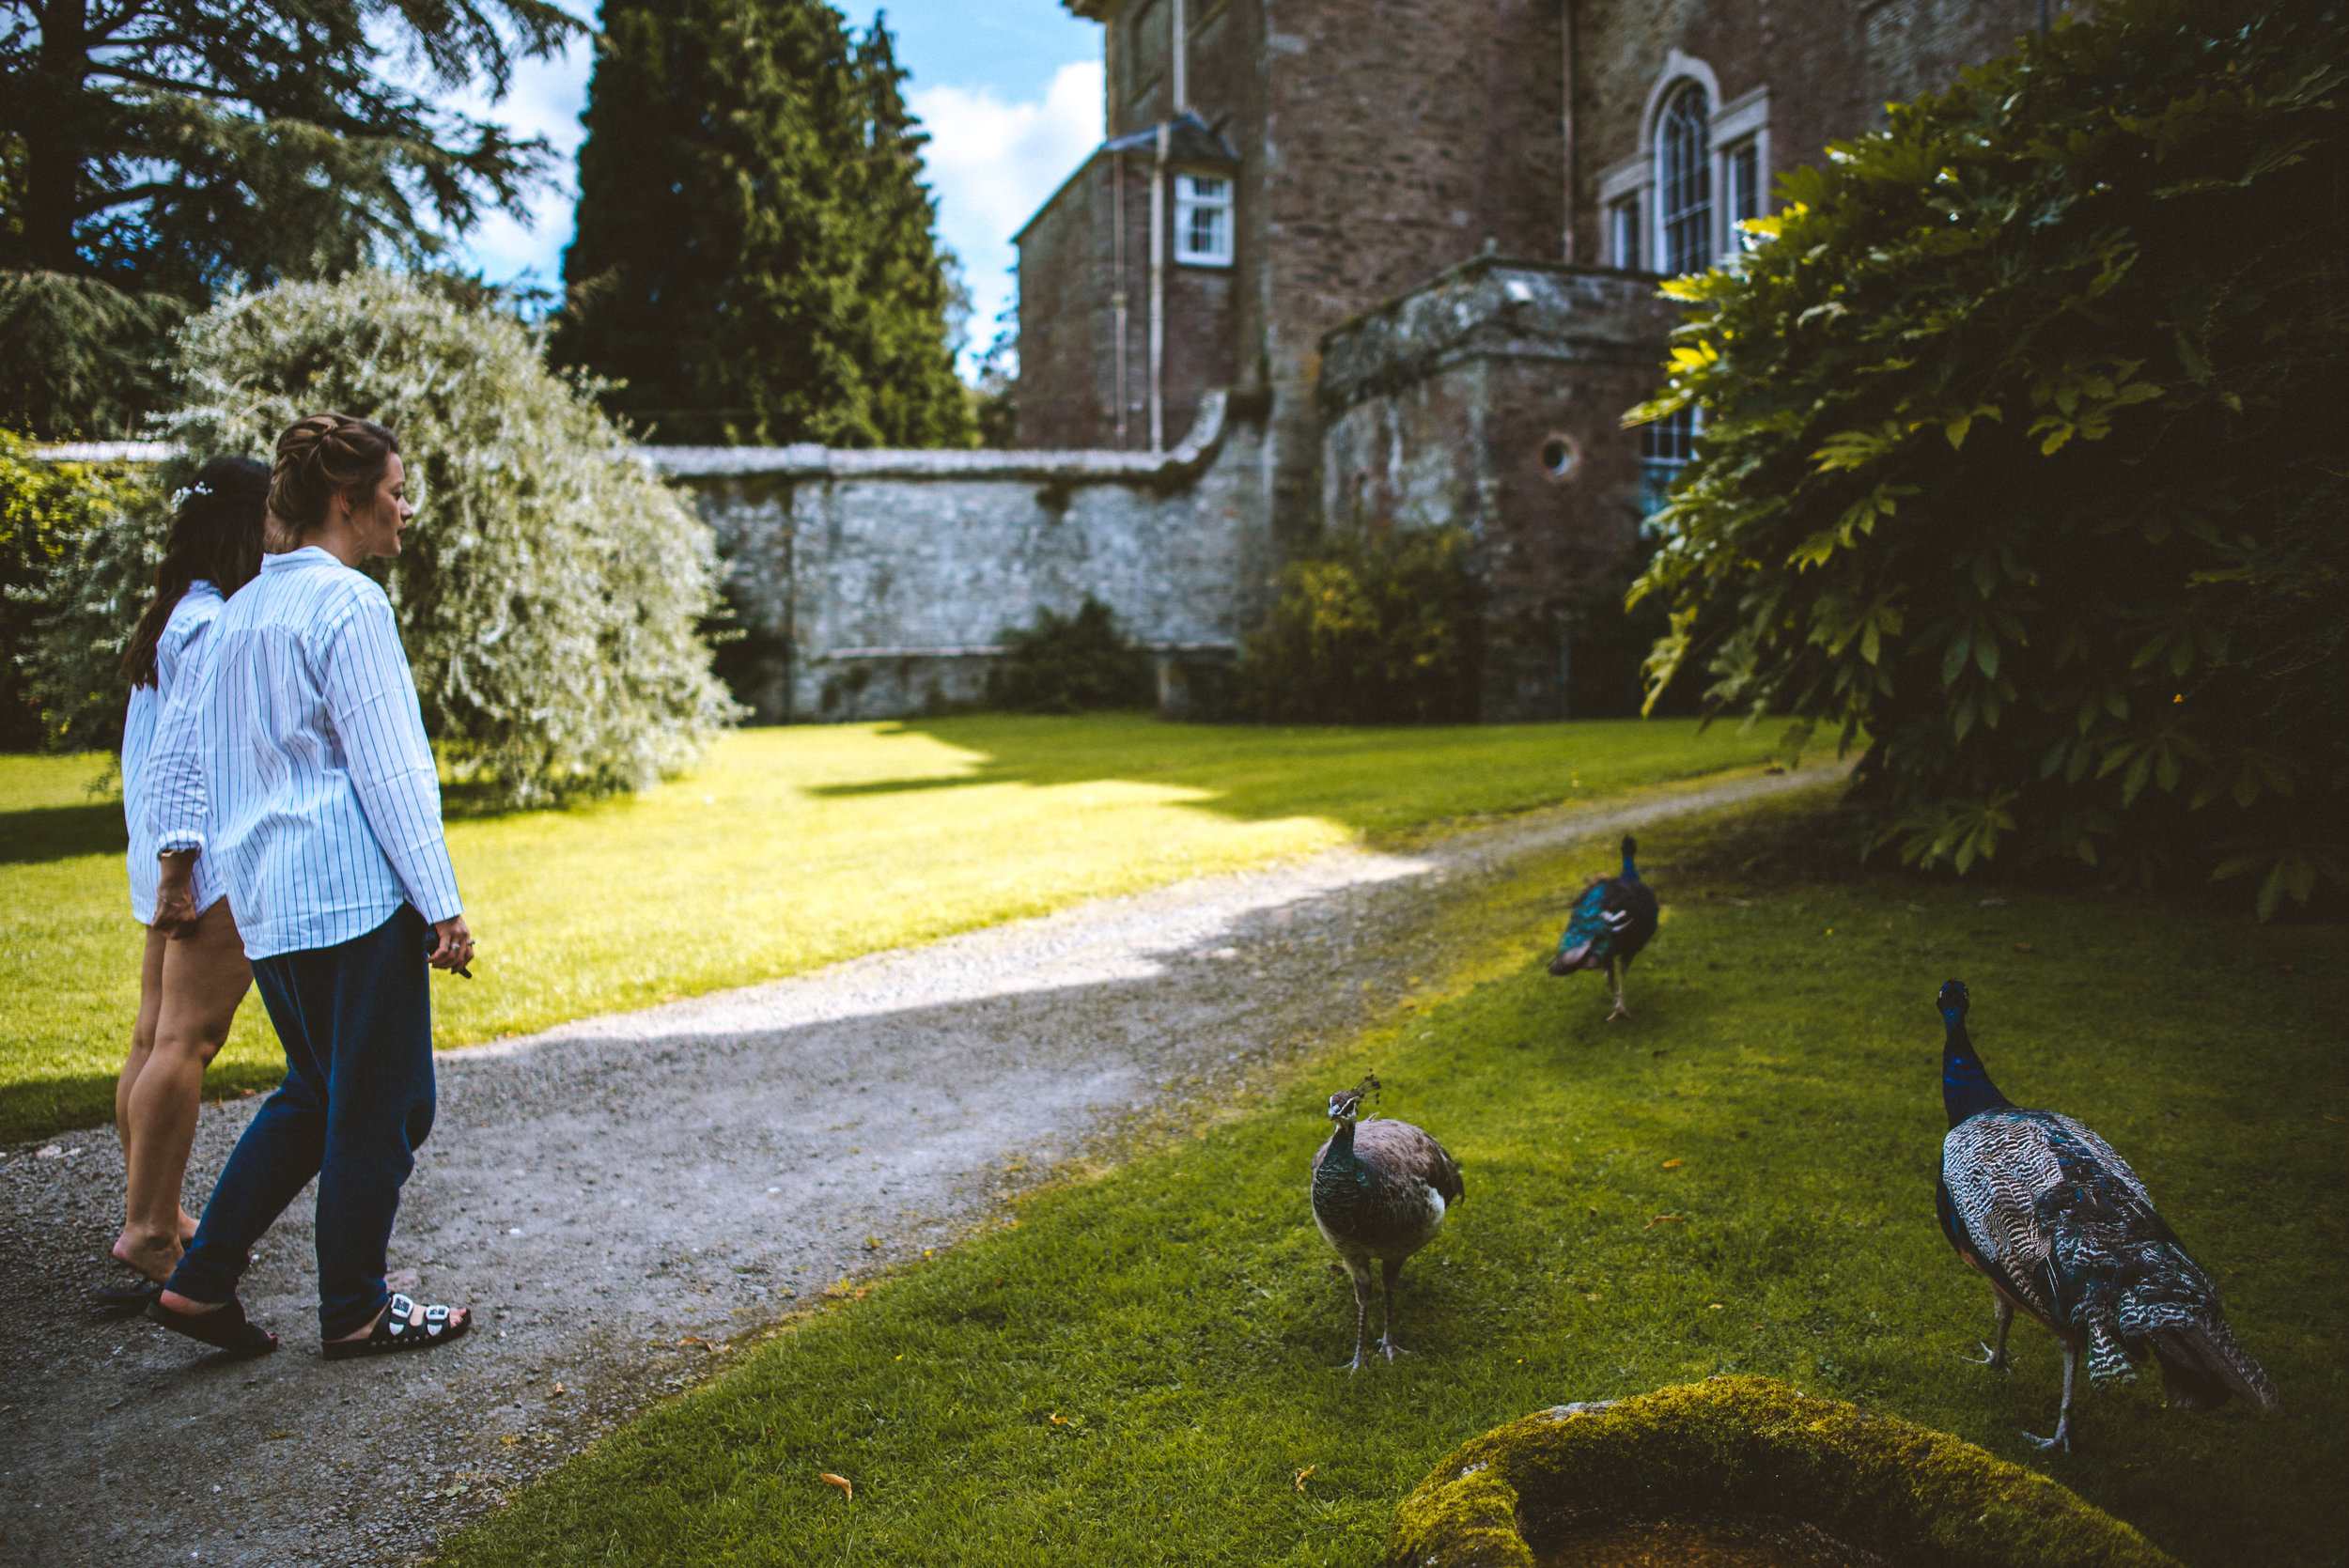 pencarrow-house-wedding-photographer-21.jpg